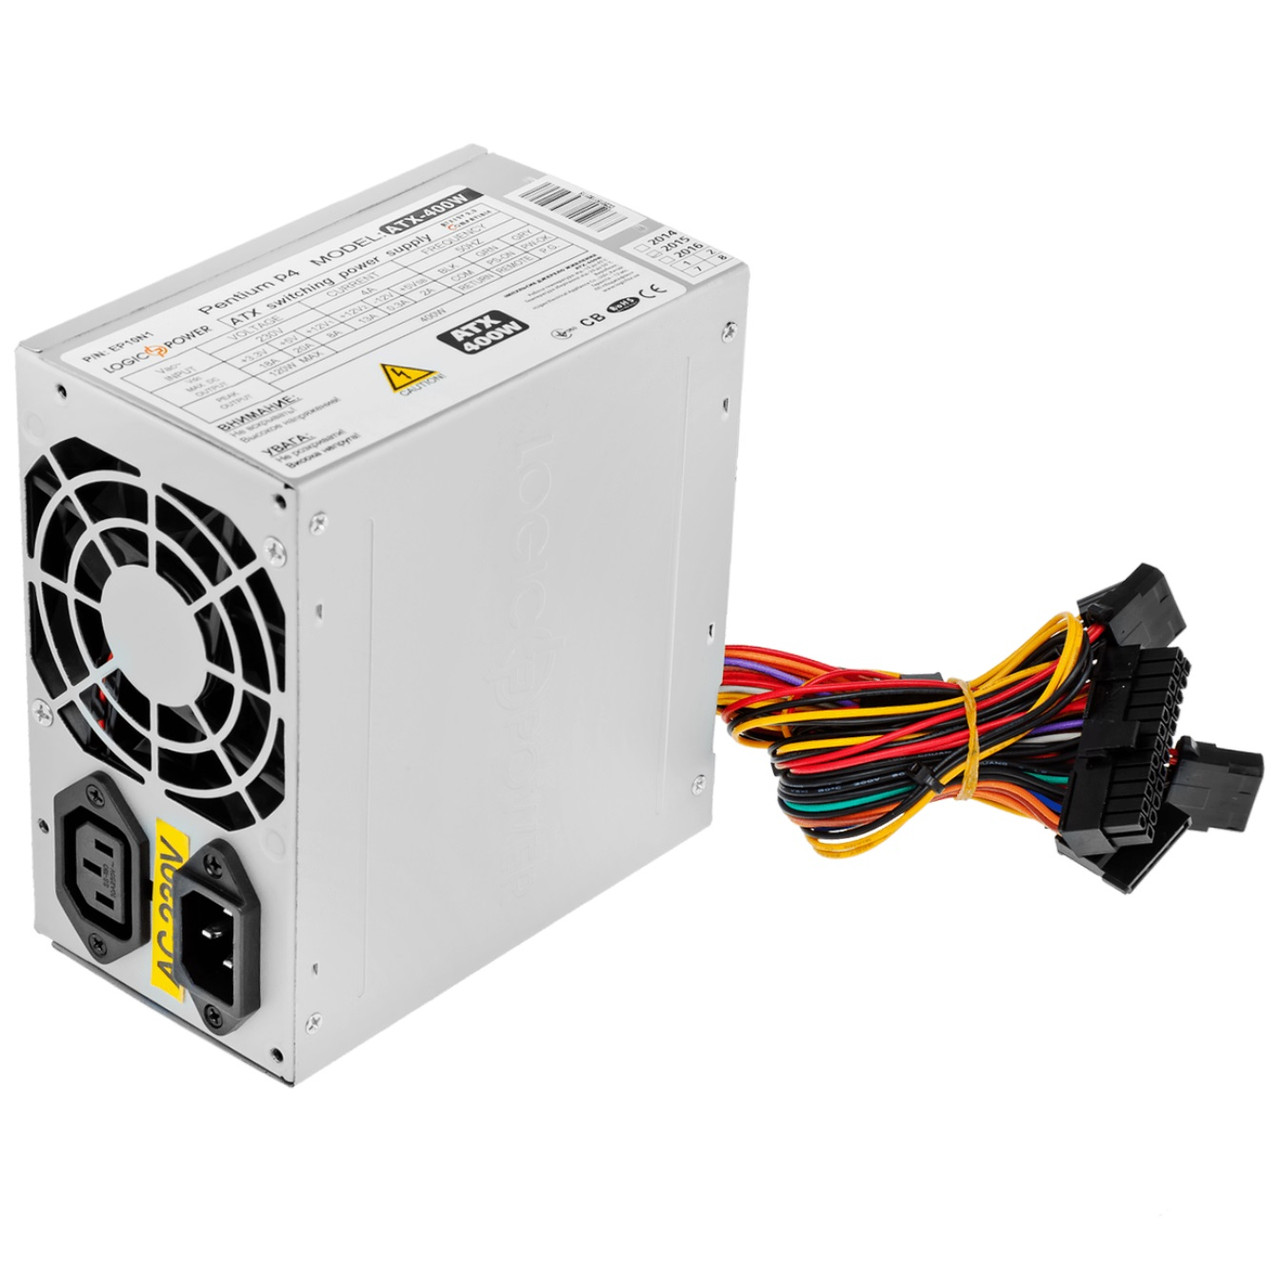 Блок питания Logicpower ATX-400W; 8см, 2 SATA, OEM, без кабеля питания